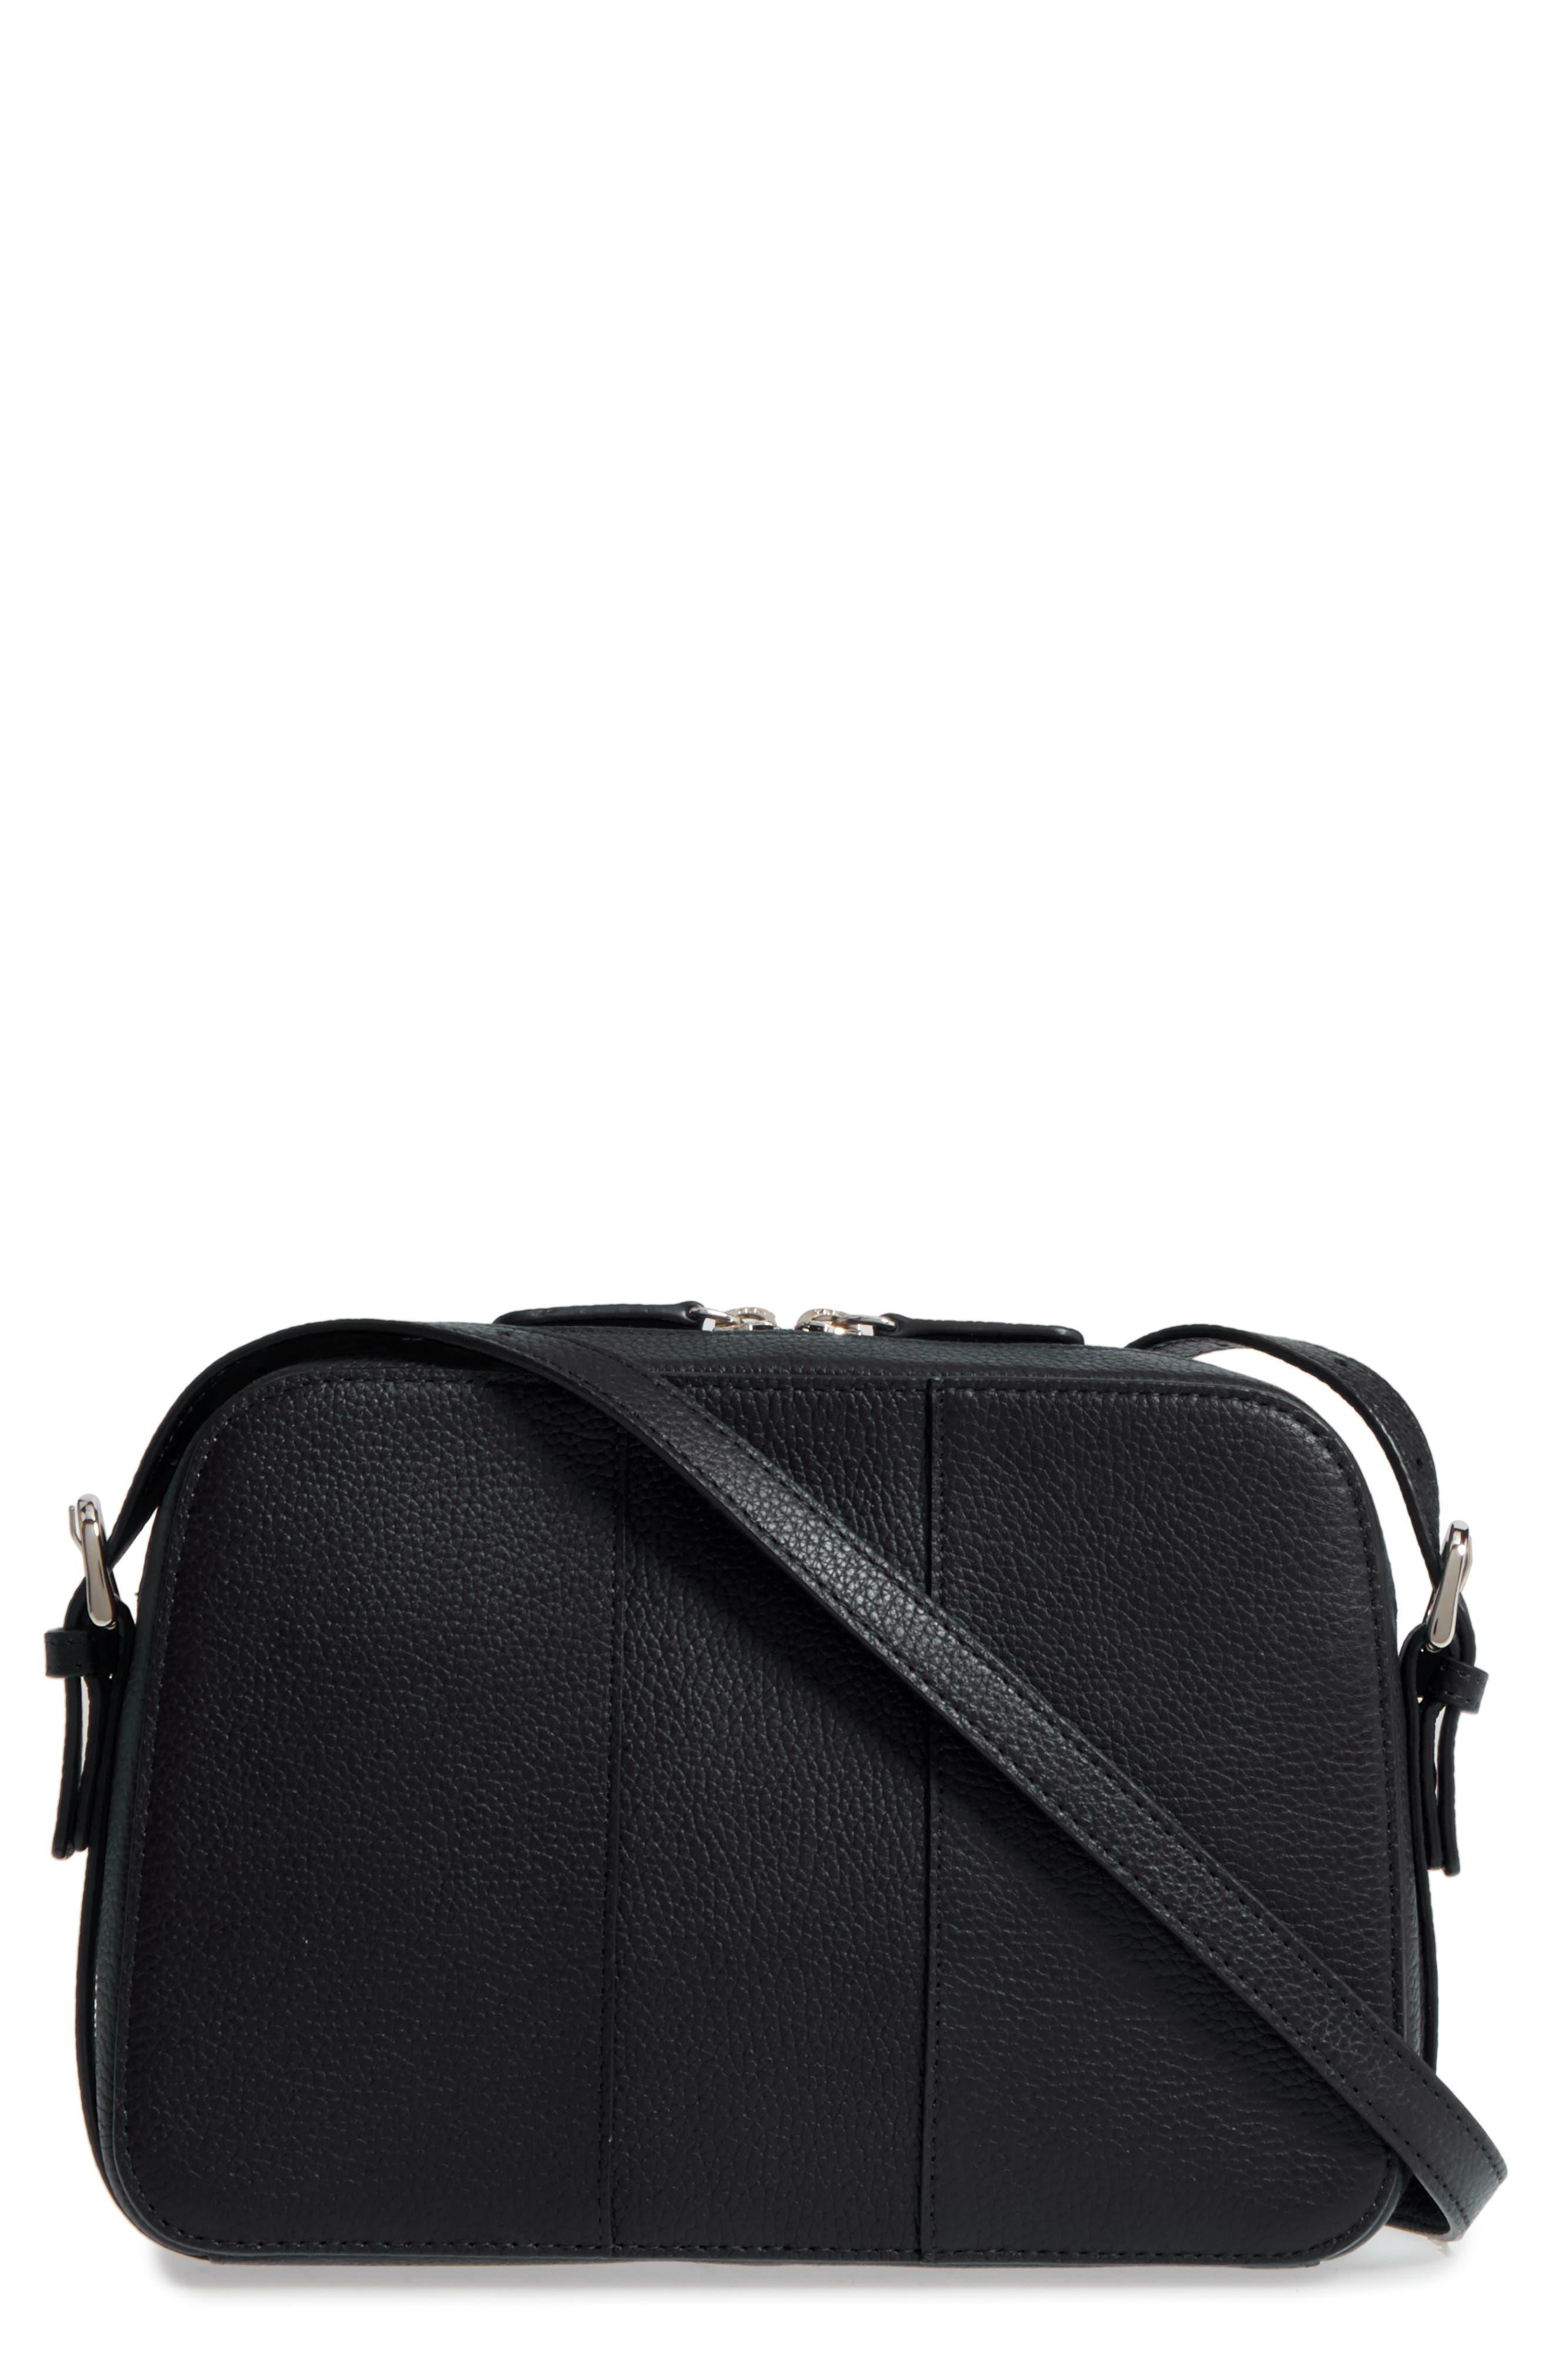 Brayden Leather Crossbody Camera Bag,                             Main thumbnail 1, color,